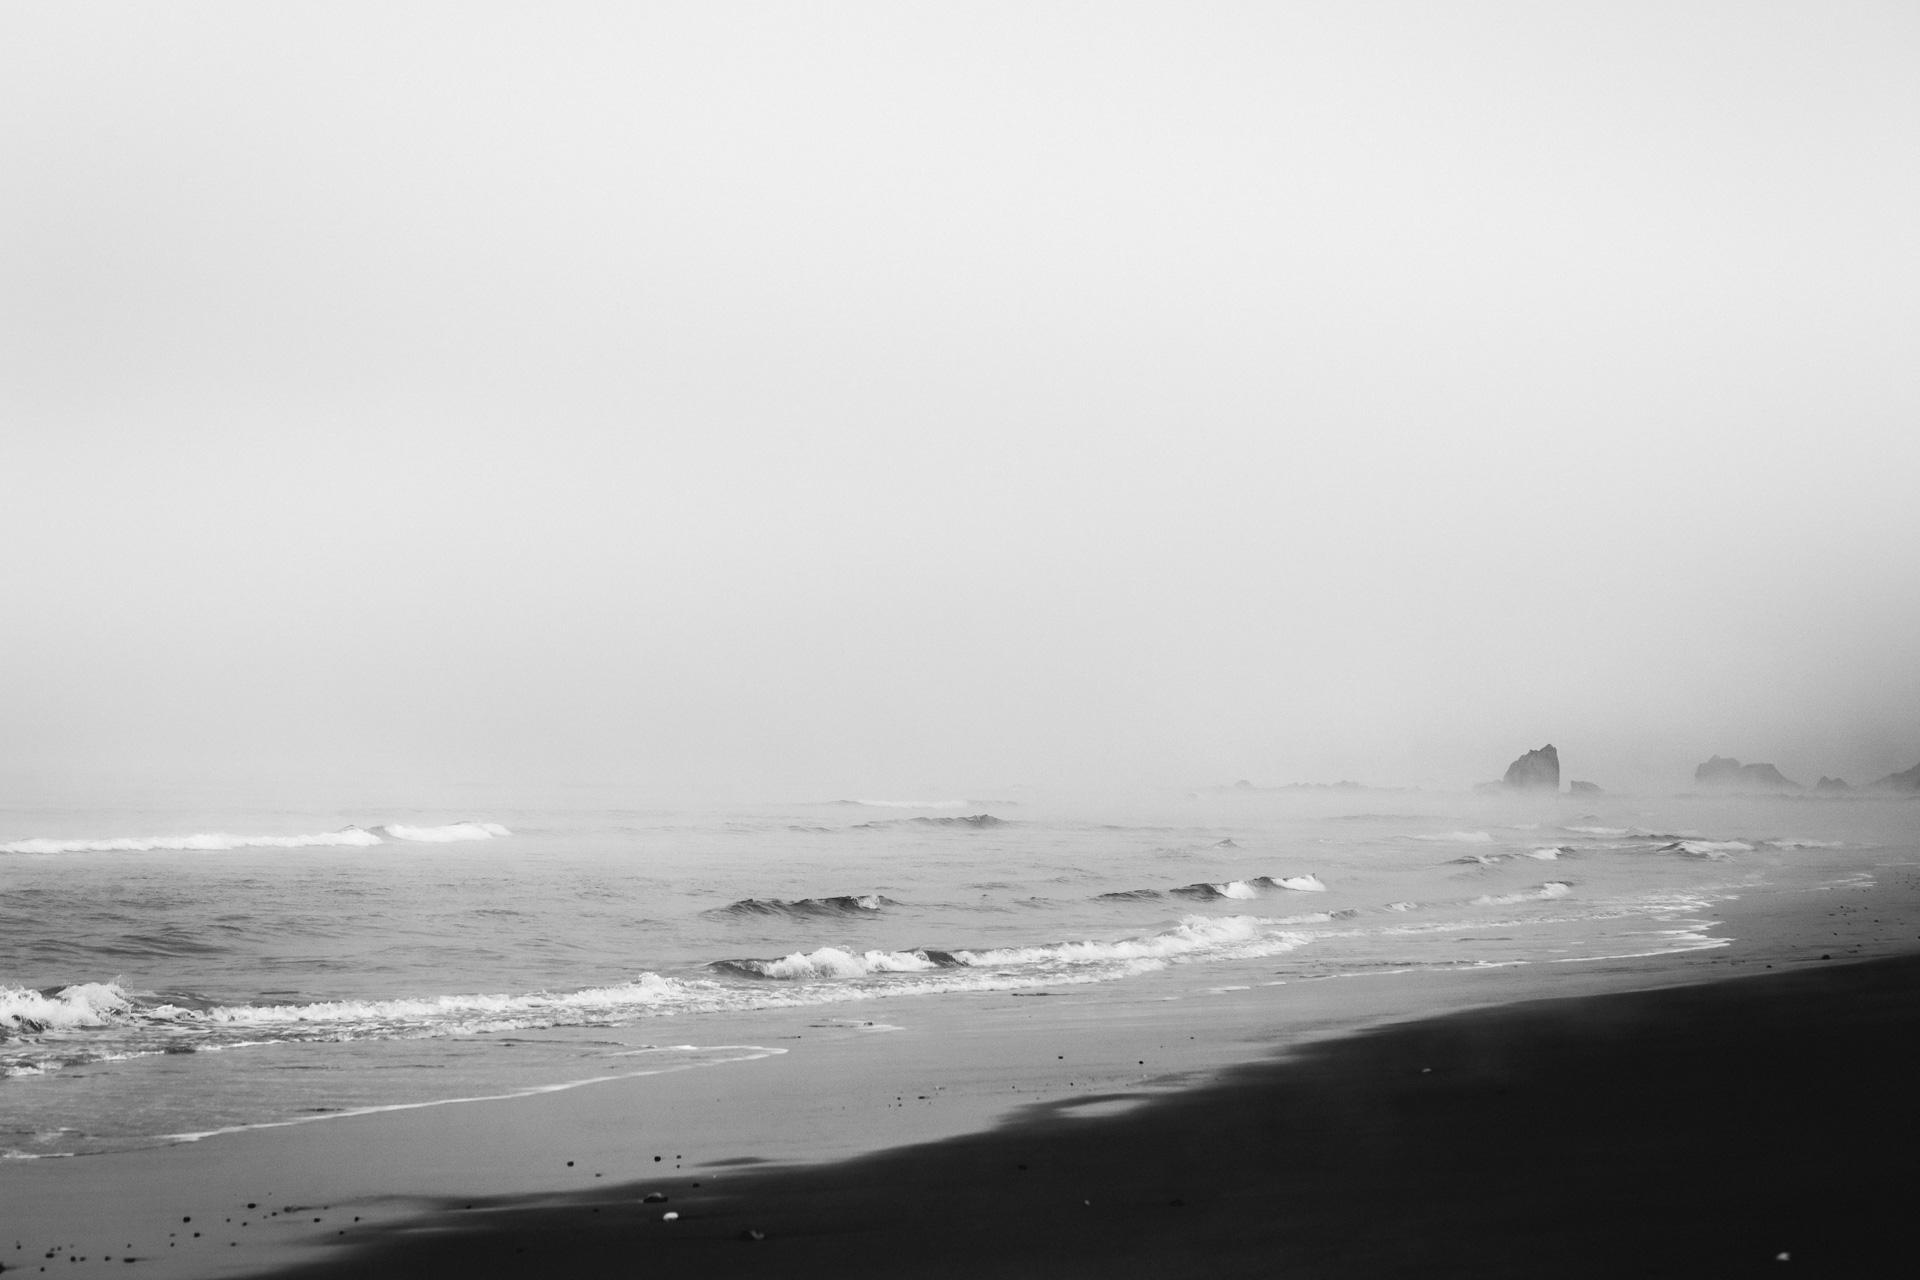 Damien-dohmen-sand-print-lx-one-14